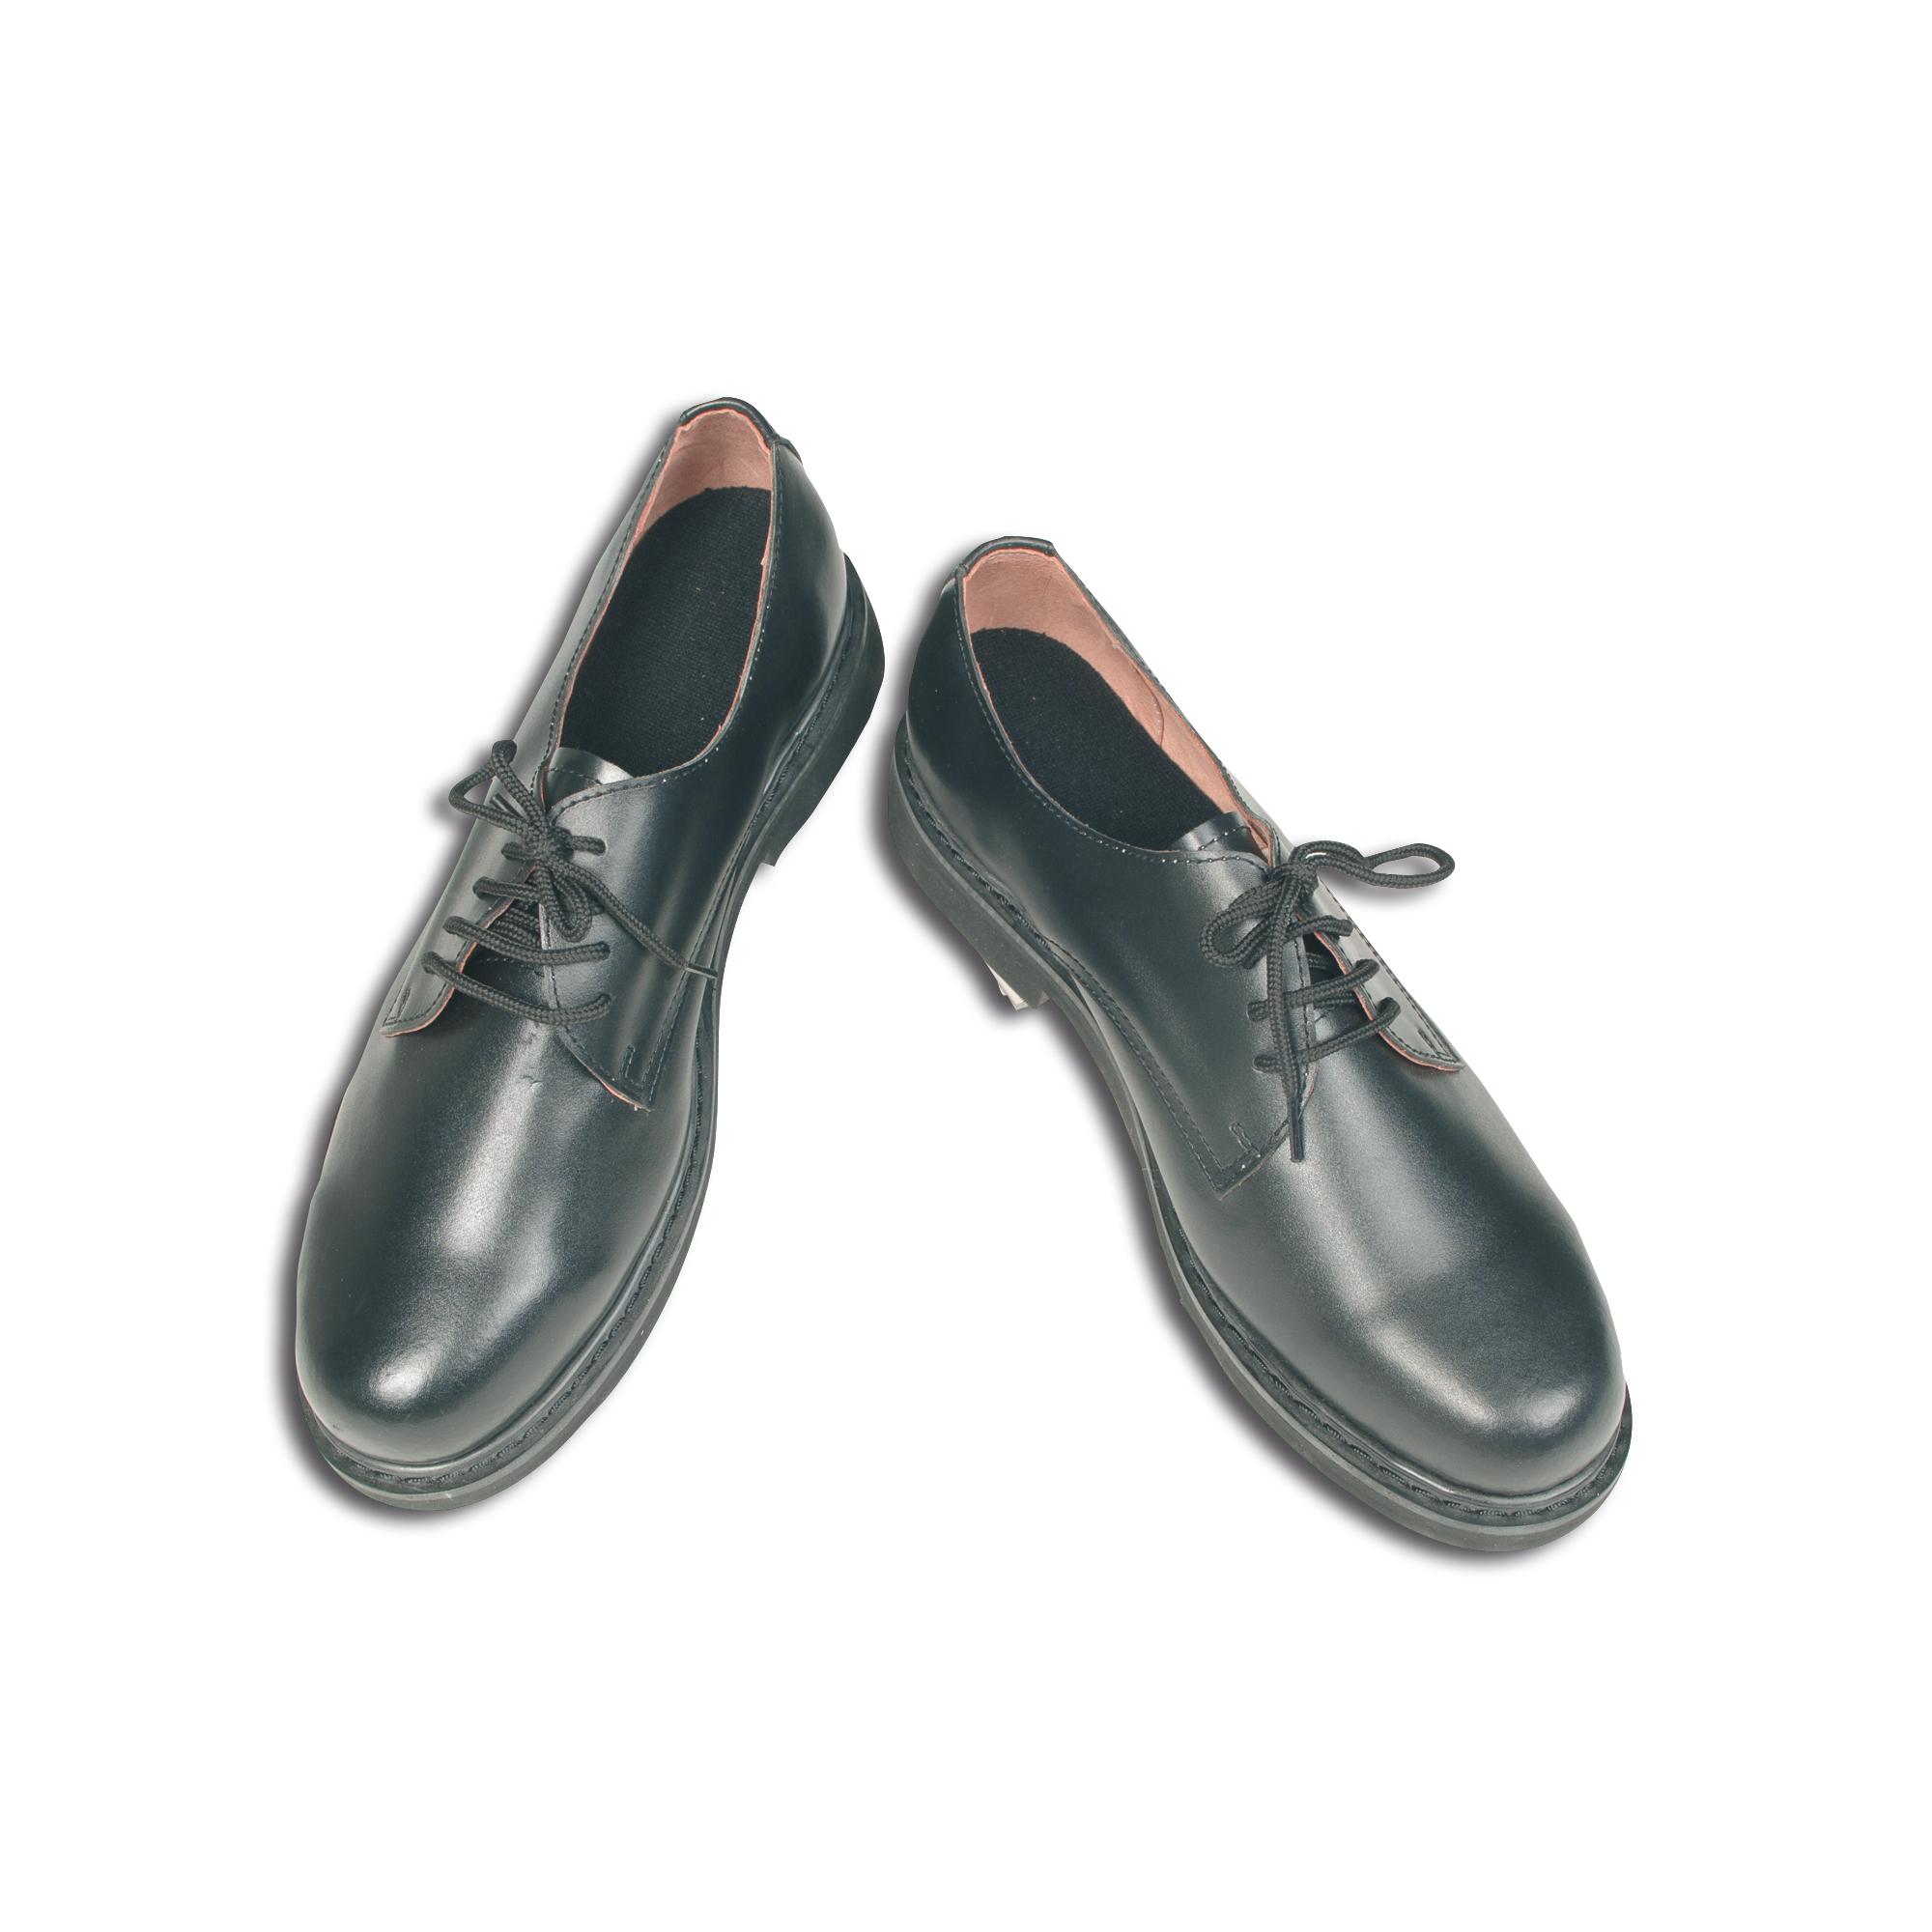 Shoes Mil-Tec black